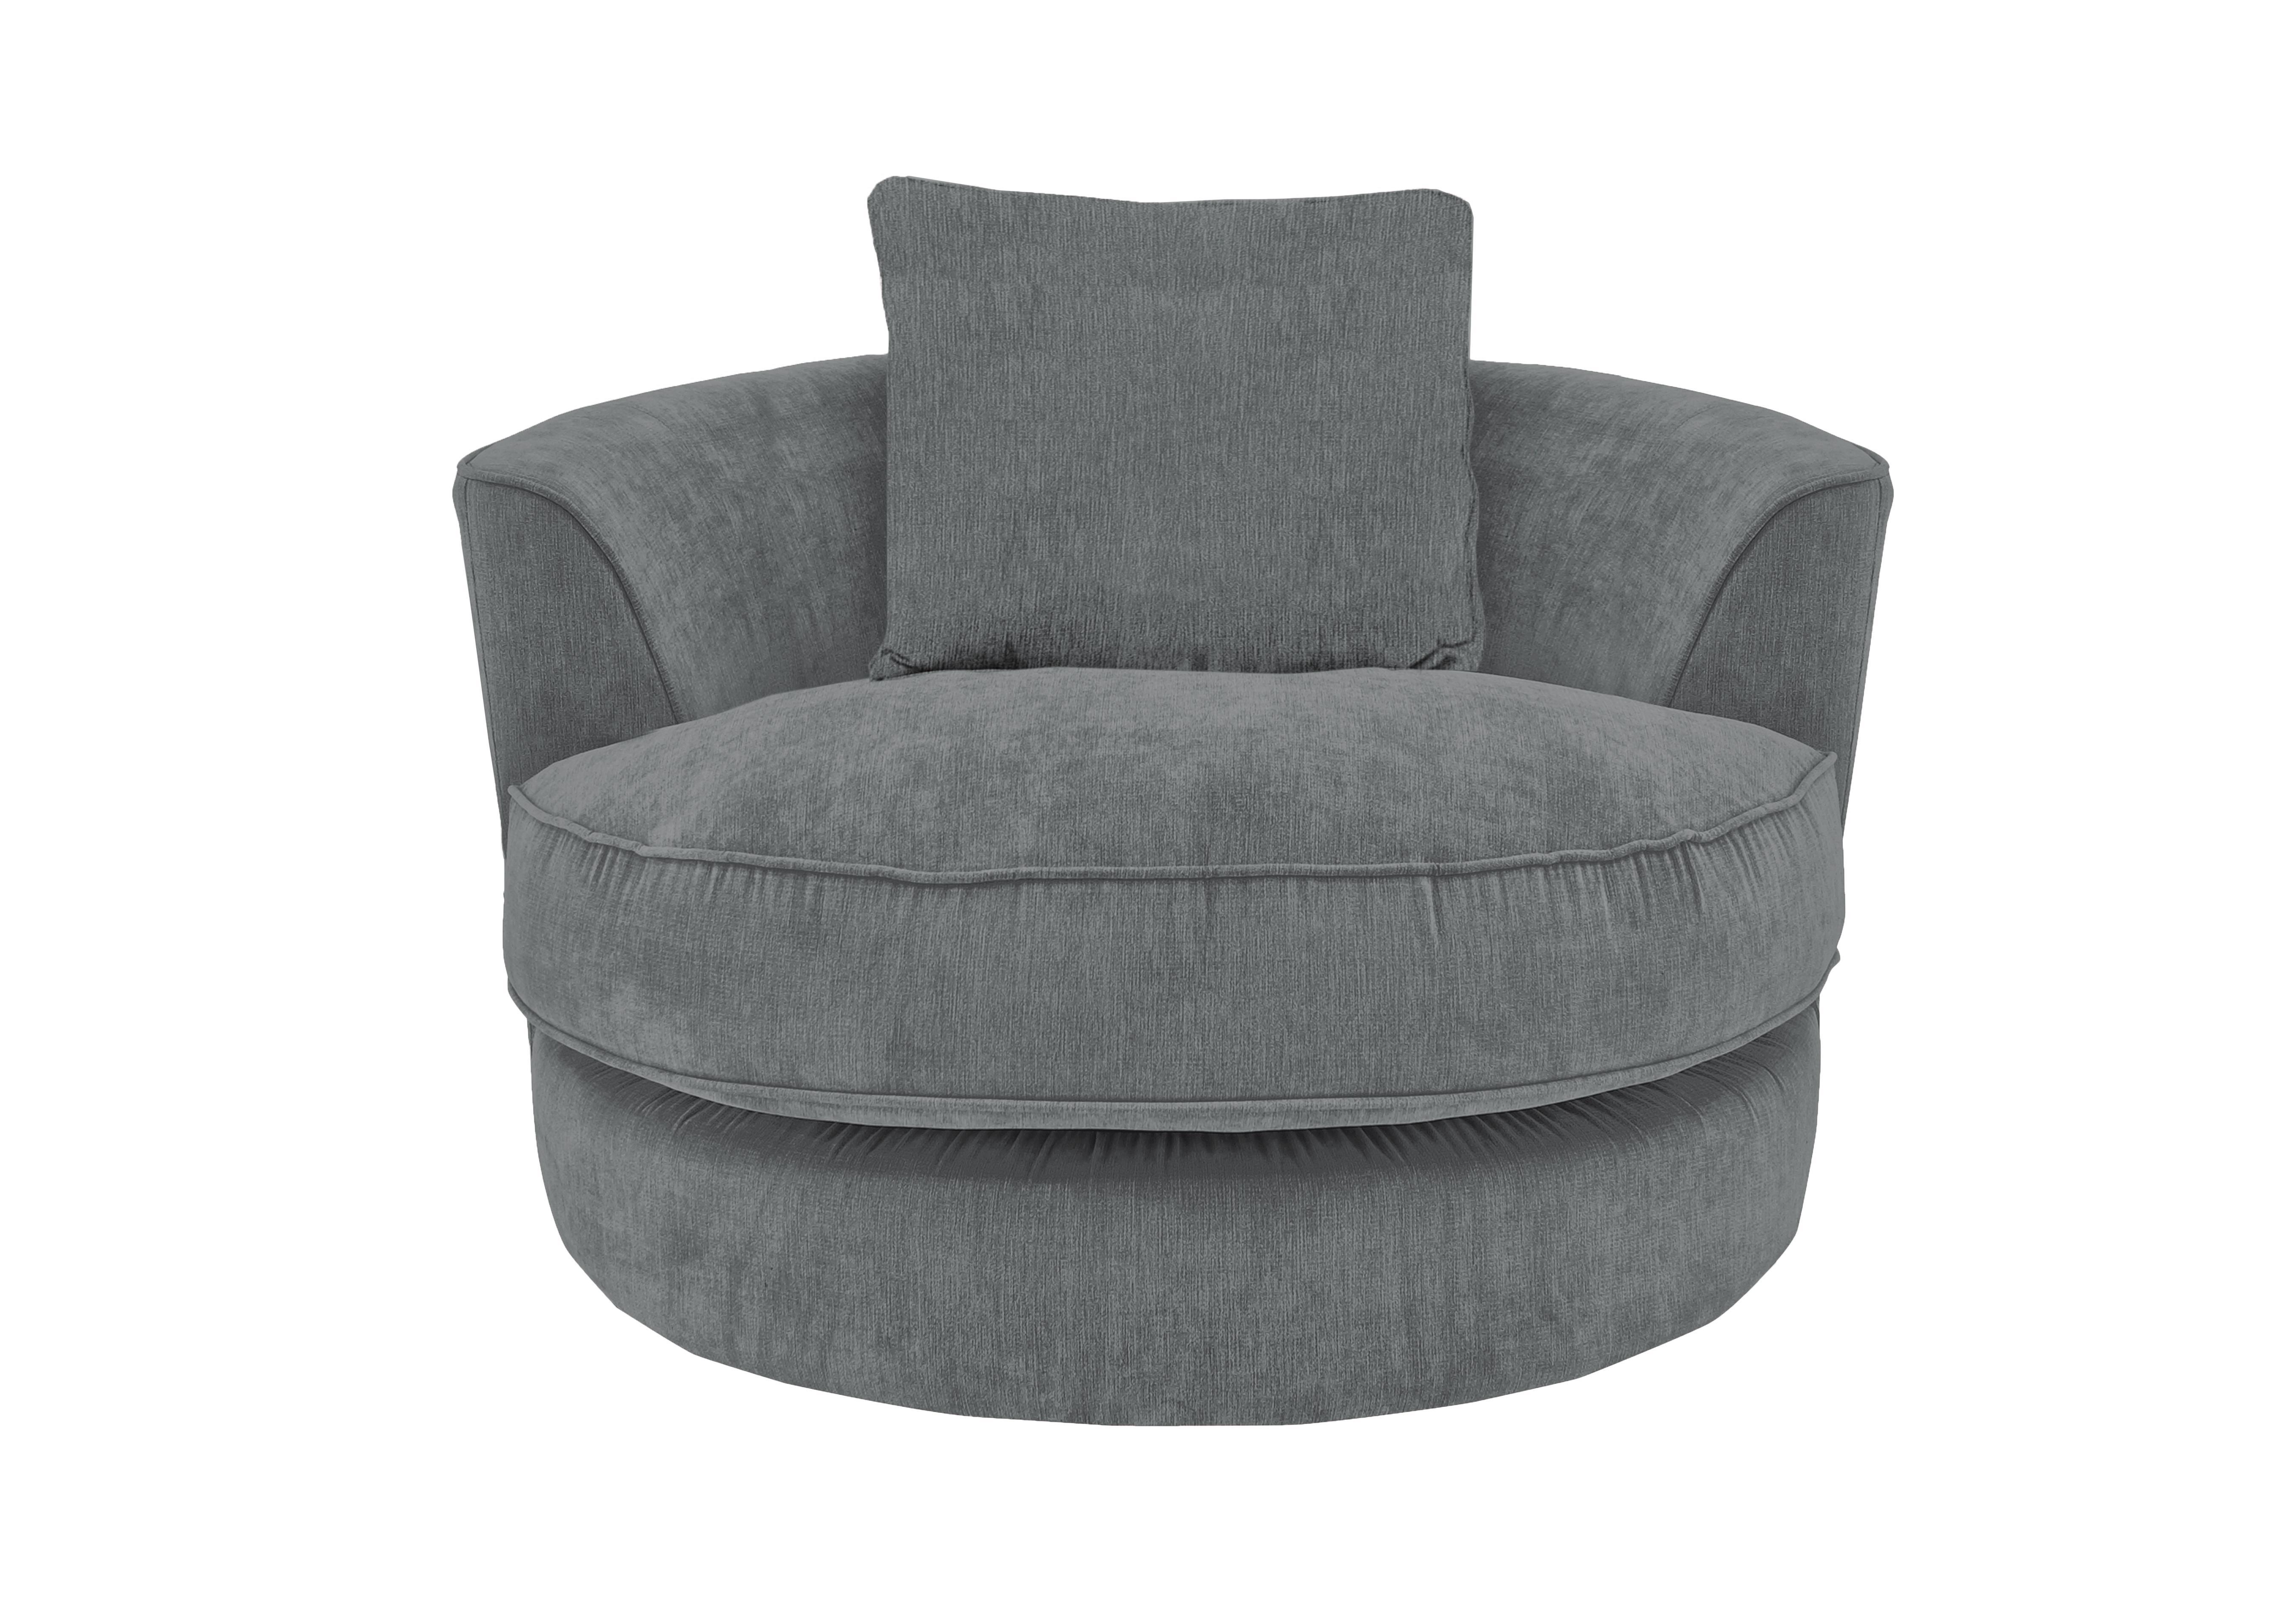 swivel armchairs furniture village rh furniturevillage co uk swivel sofa chair ebay swivel chair sofa bed